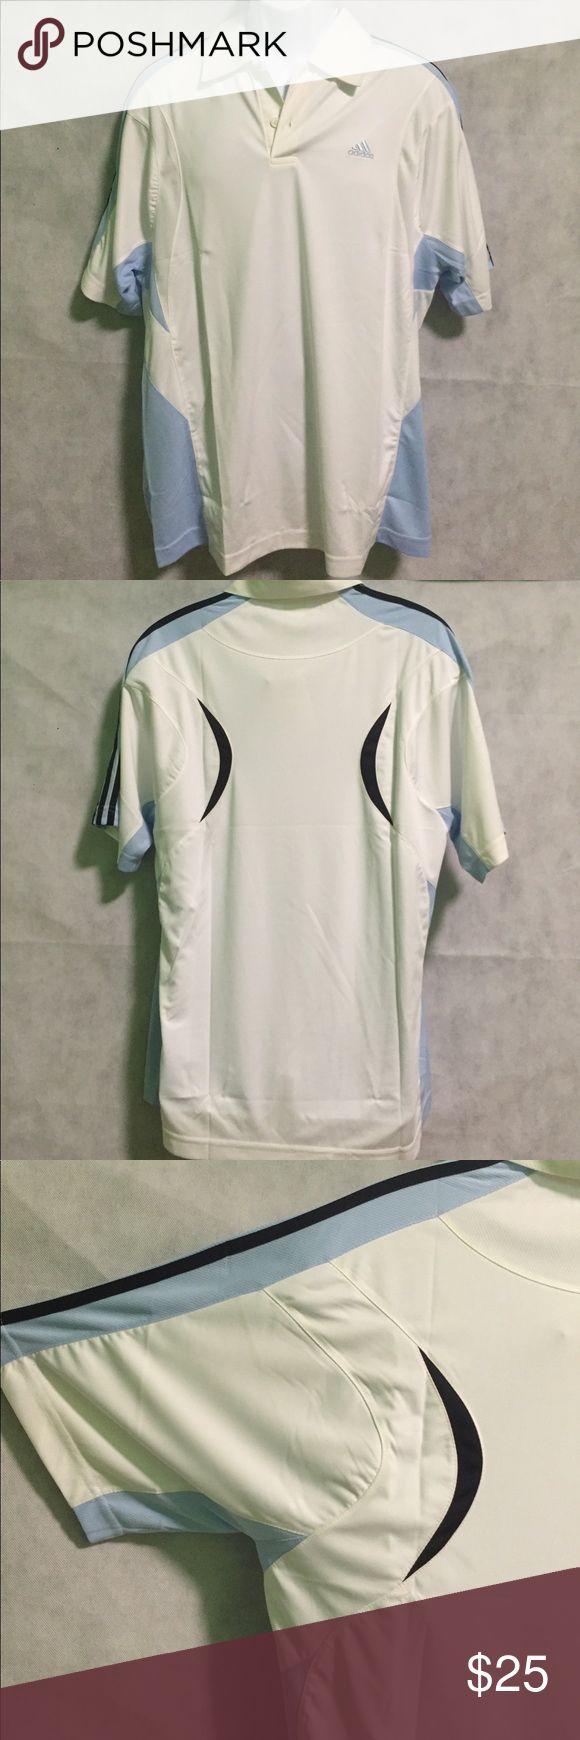 Adidas Safo sport men's polo shirt size XL New Adidas men sport polo shirt. New! made in Singapore. adidas Shirts Polos